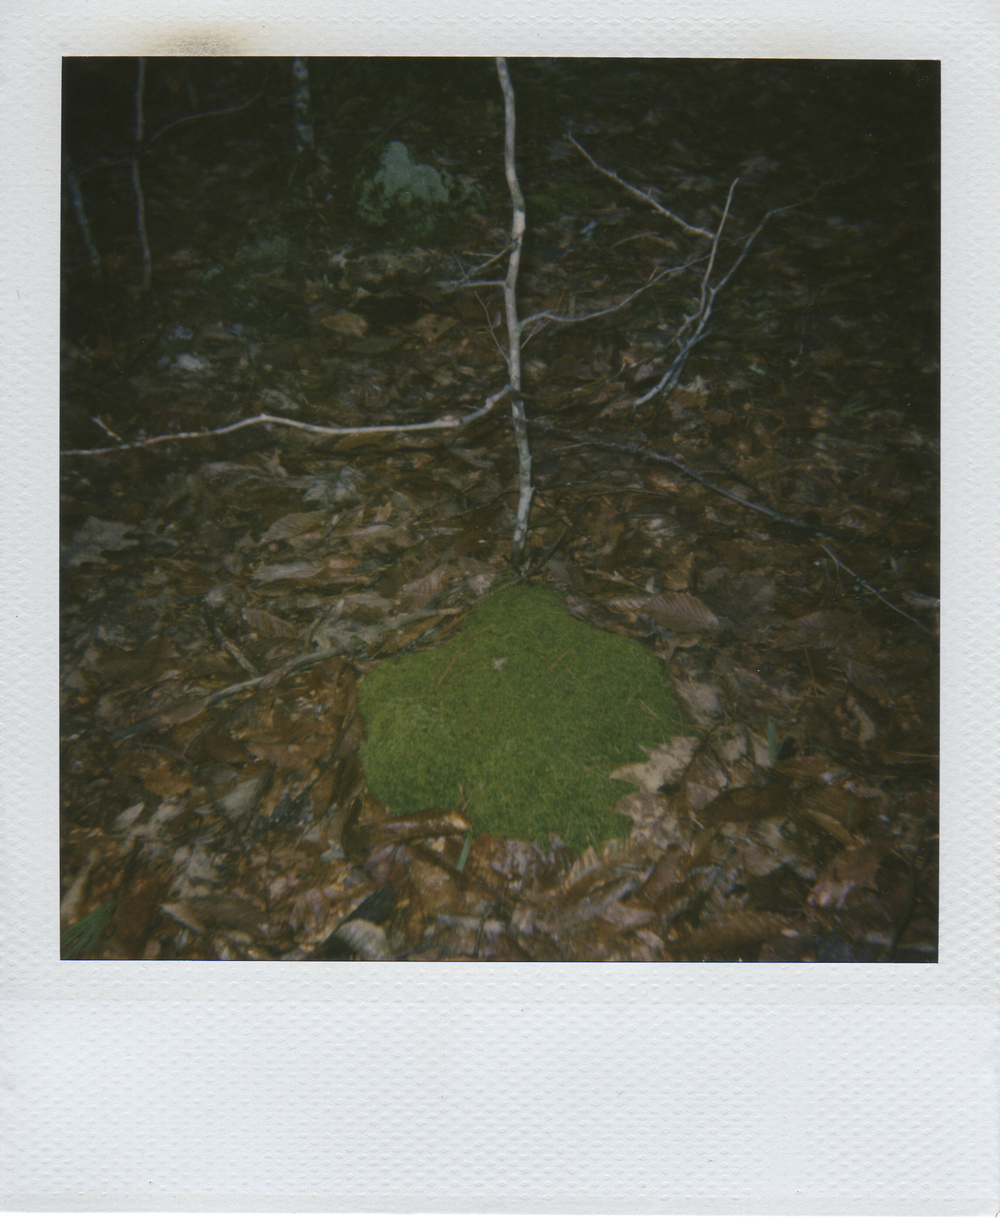 jlaurence-polaroid-122.jpg